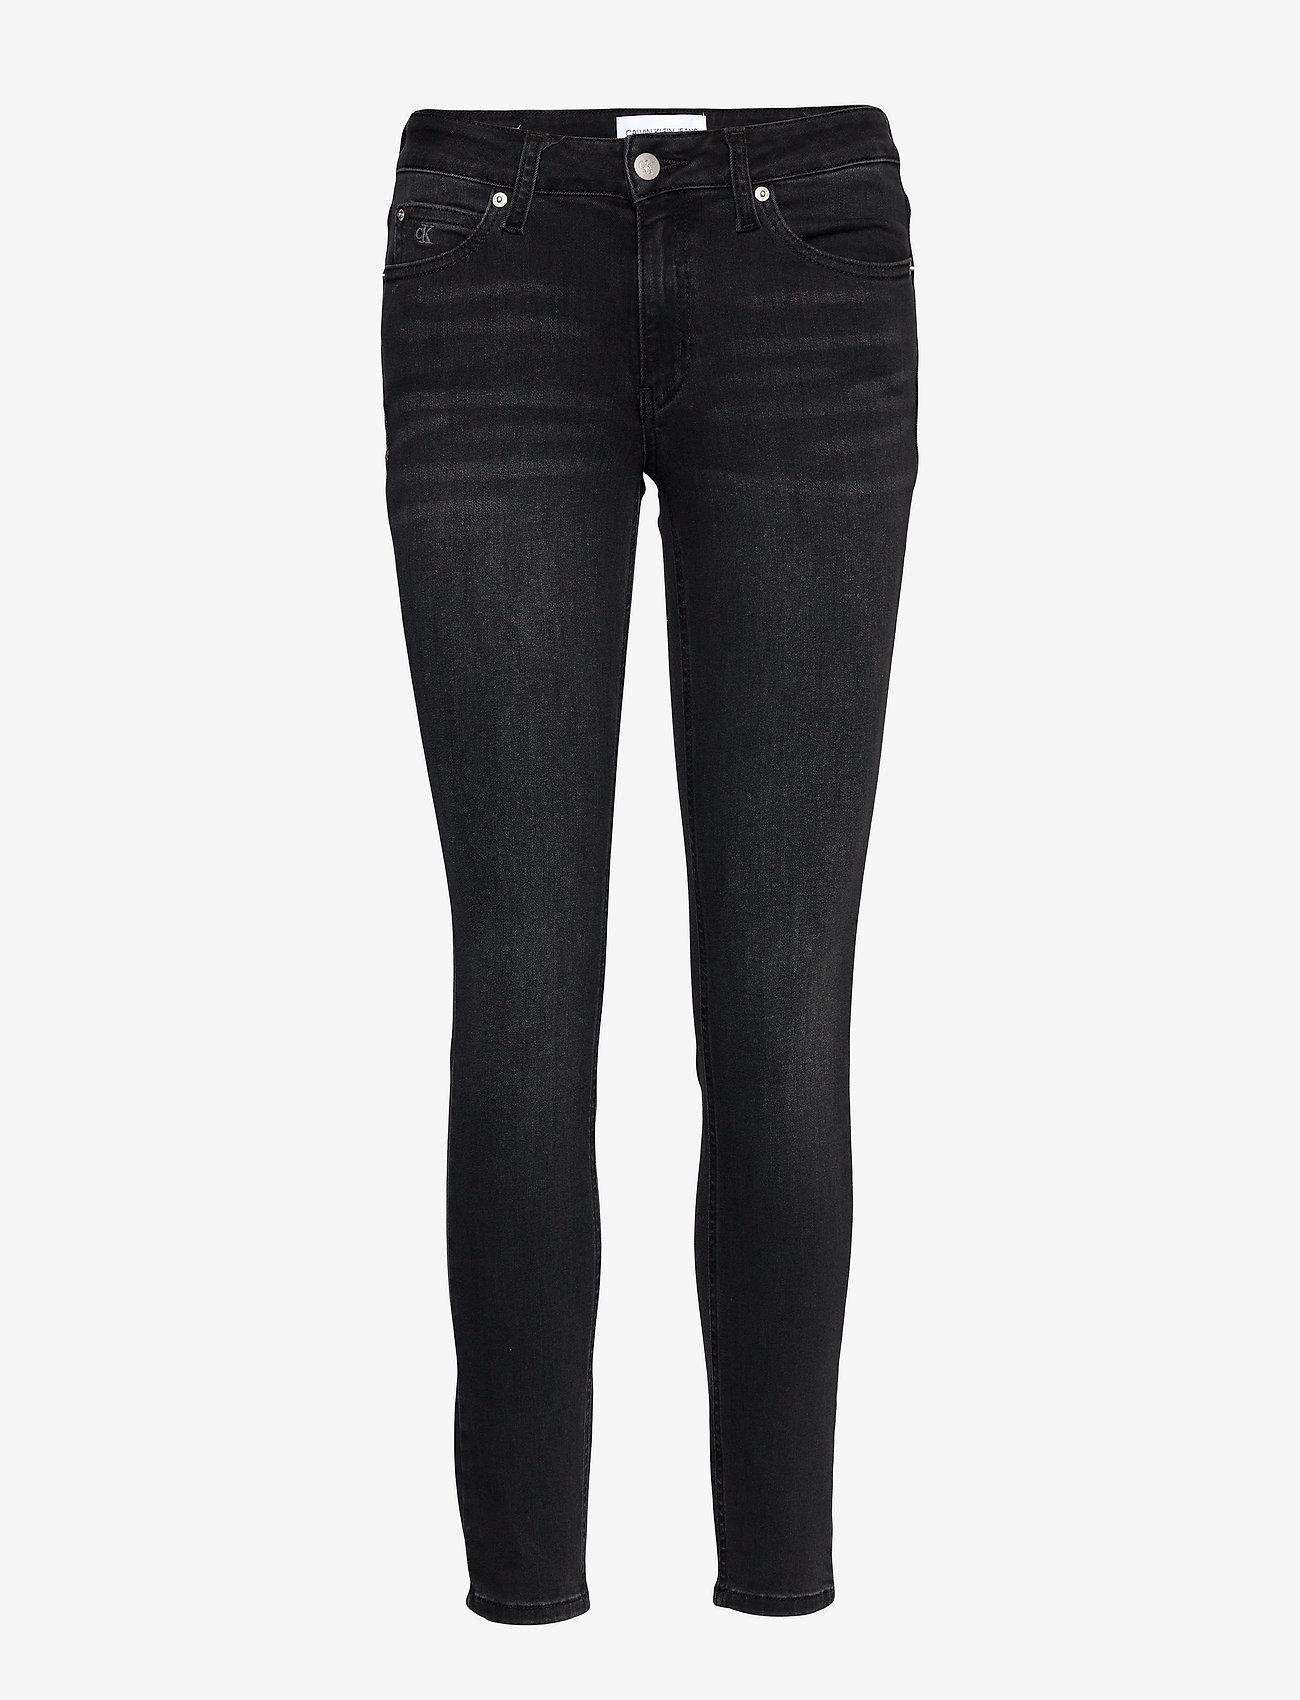 Calvin Klein Jeans - CKJ 011 MID RISE SKI - skinny jeans - zz002 washed black - 0